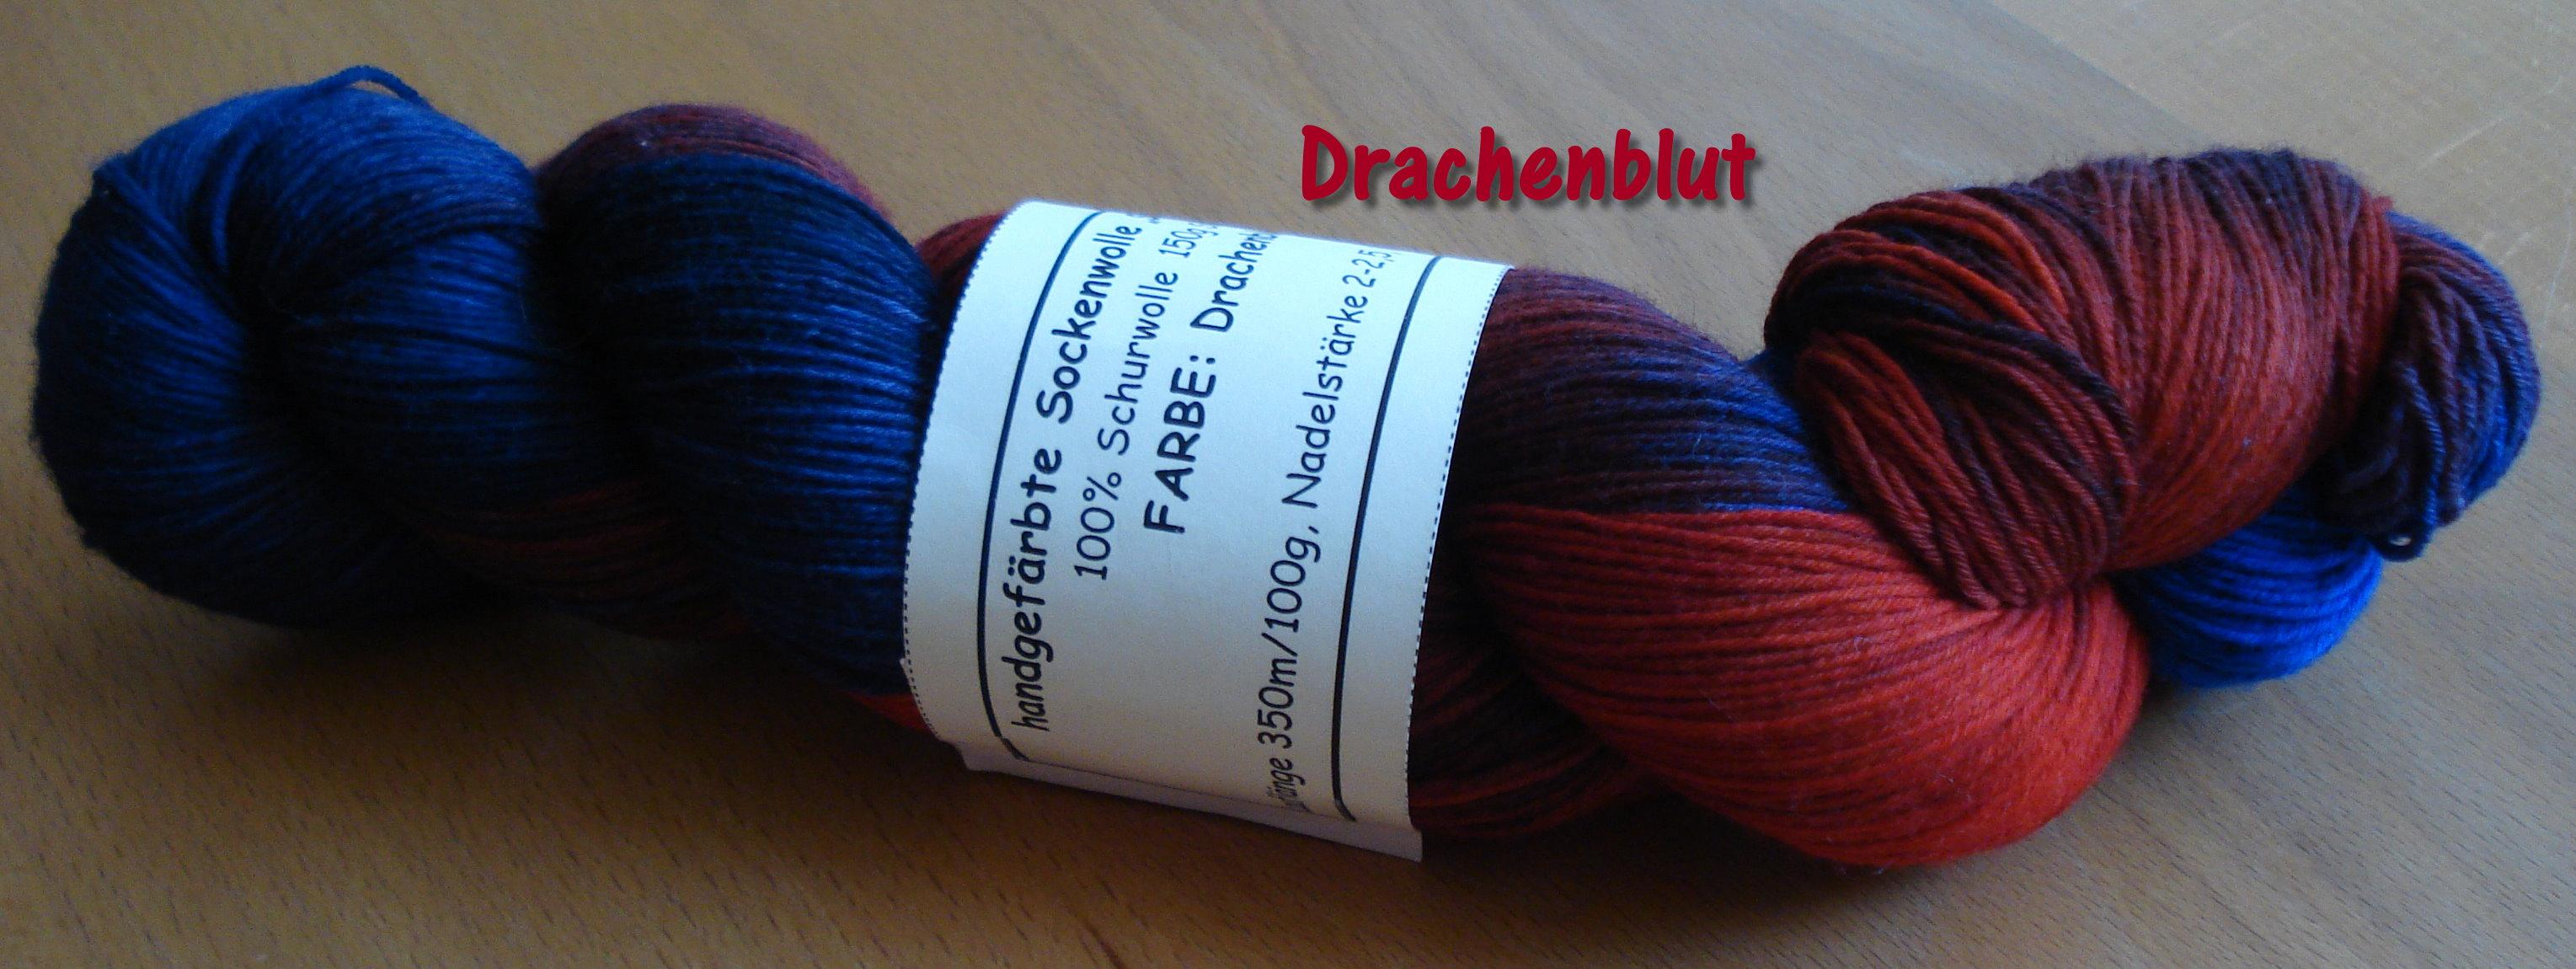 wollmeise-drachenblut.JPG